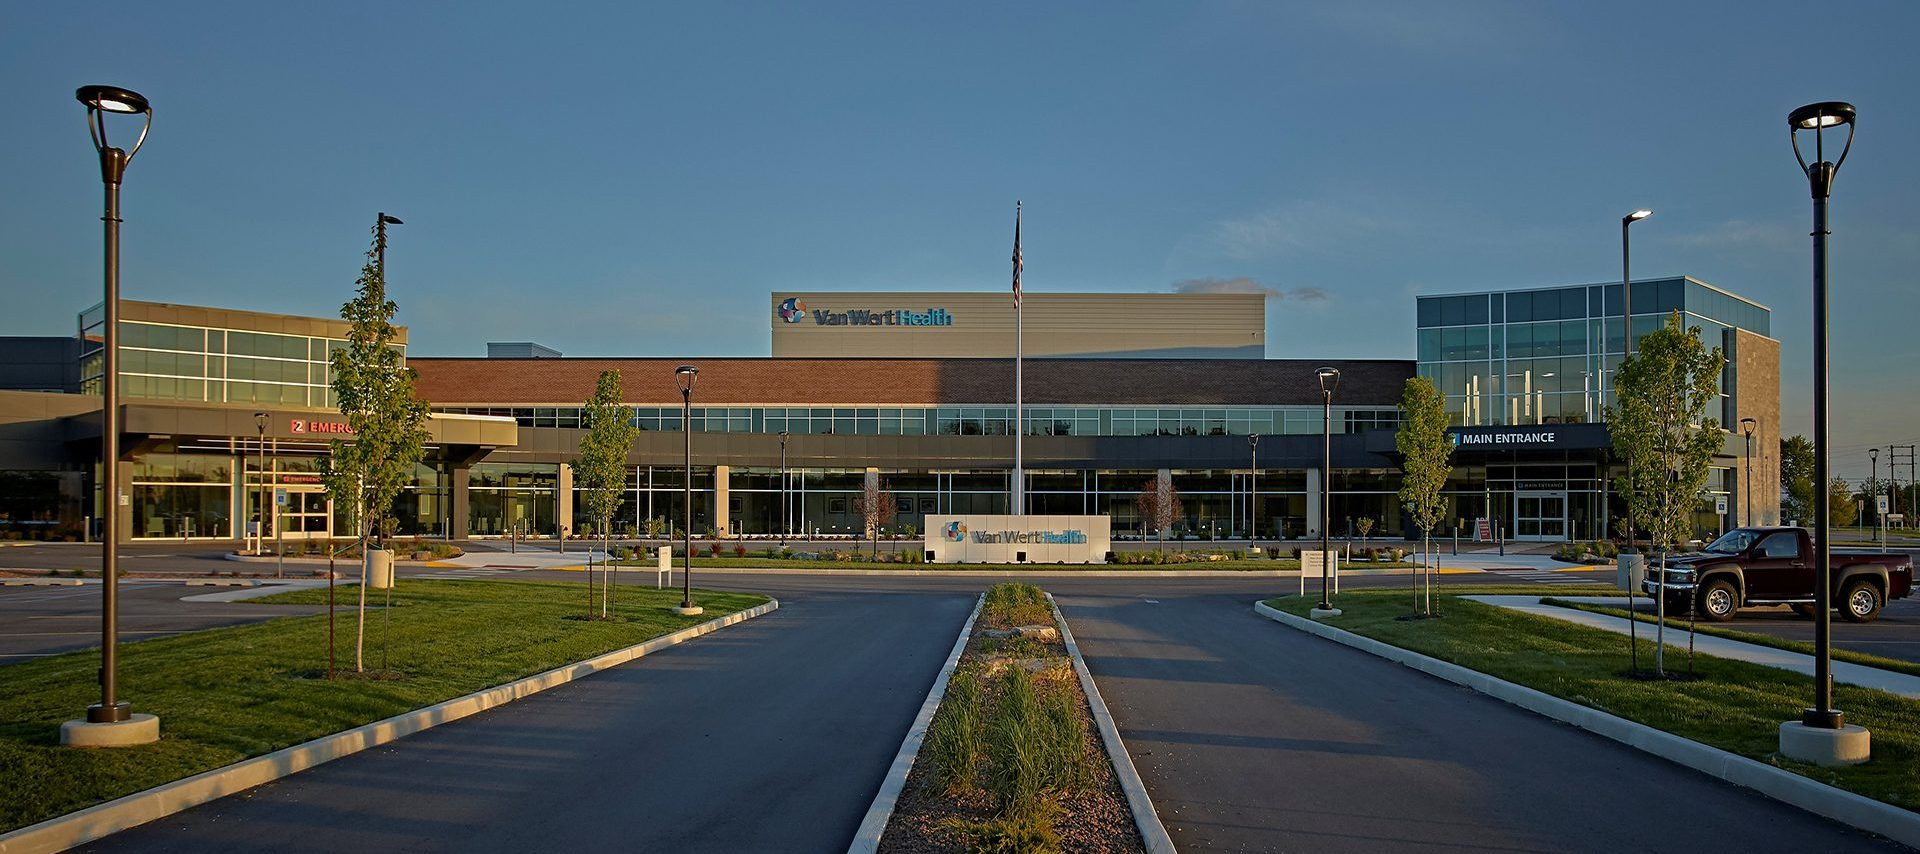 Van Wert Health Surgery and Inpatient Center